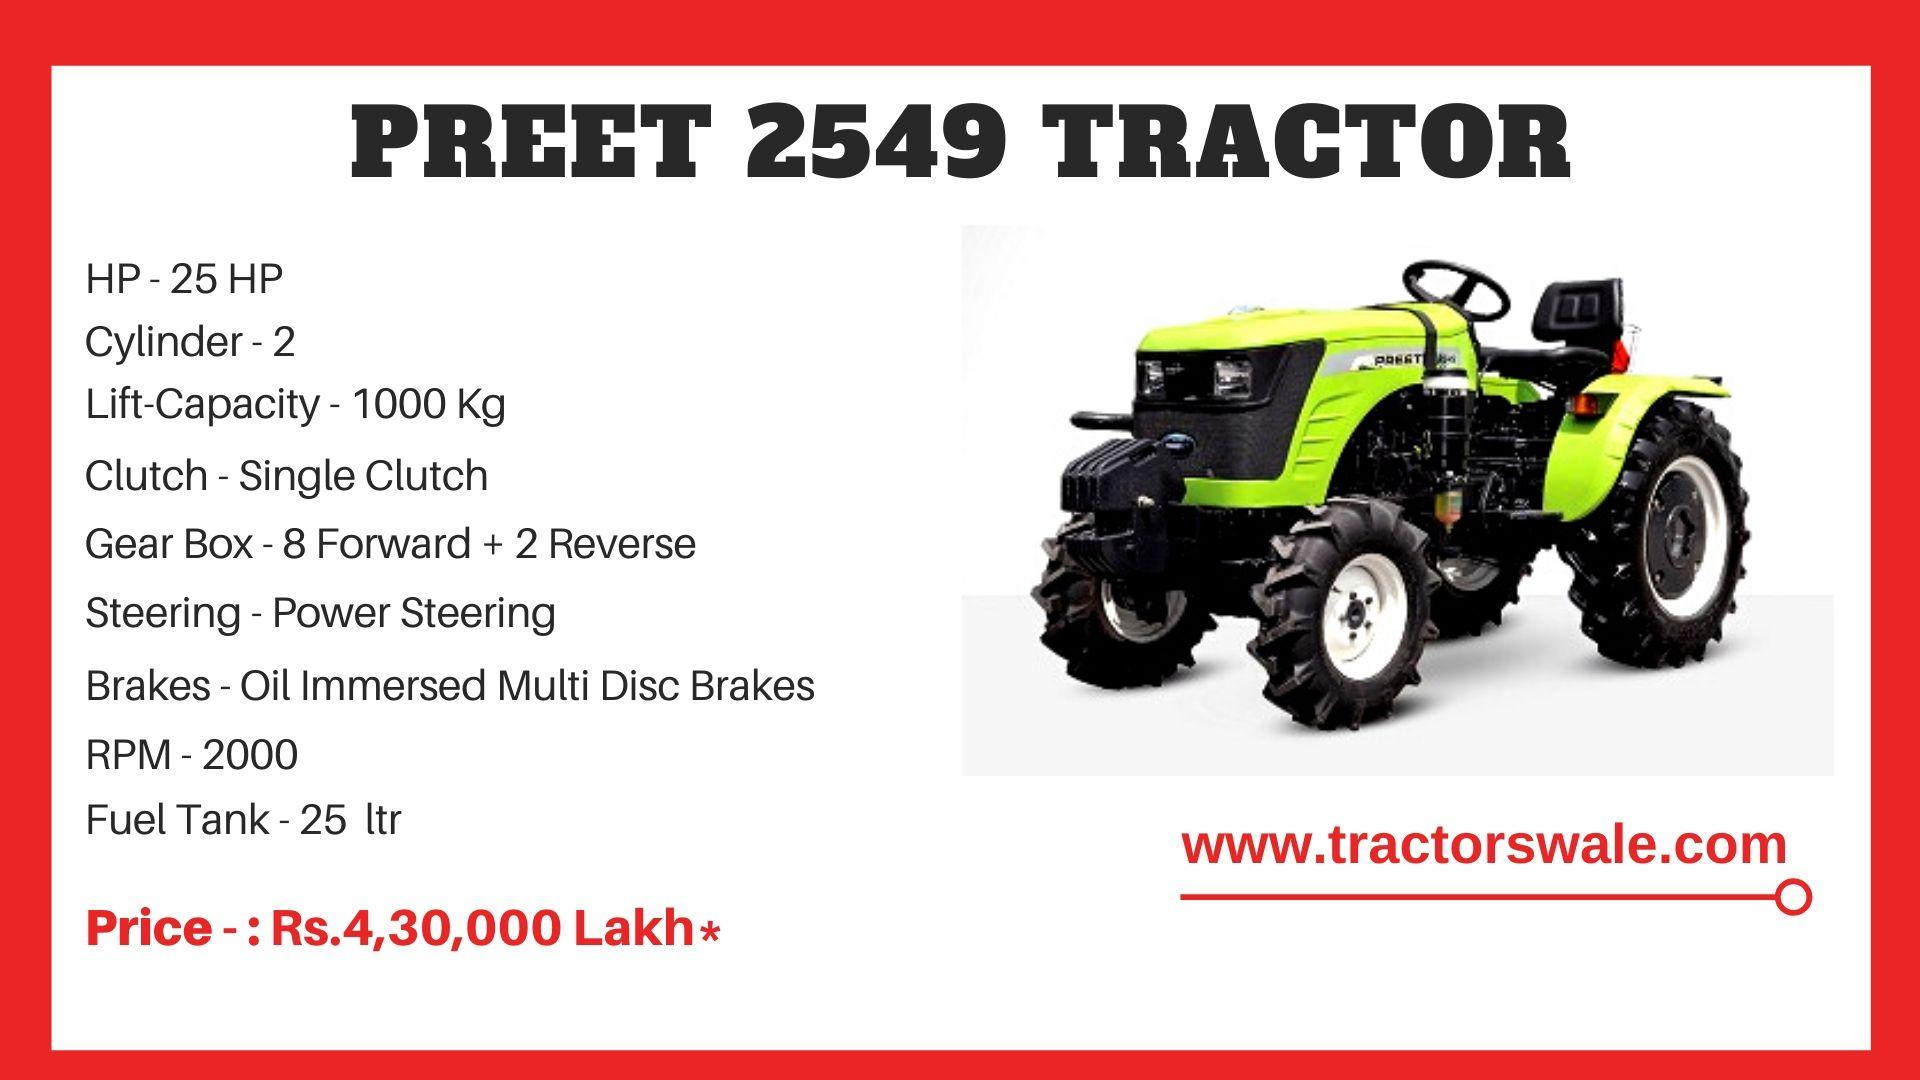 Preet 2549 tractor Price